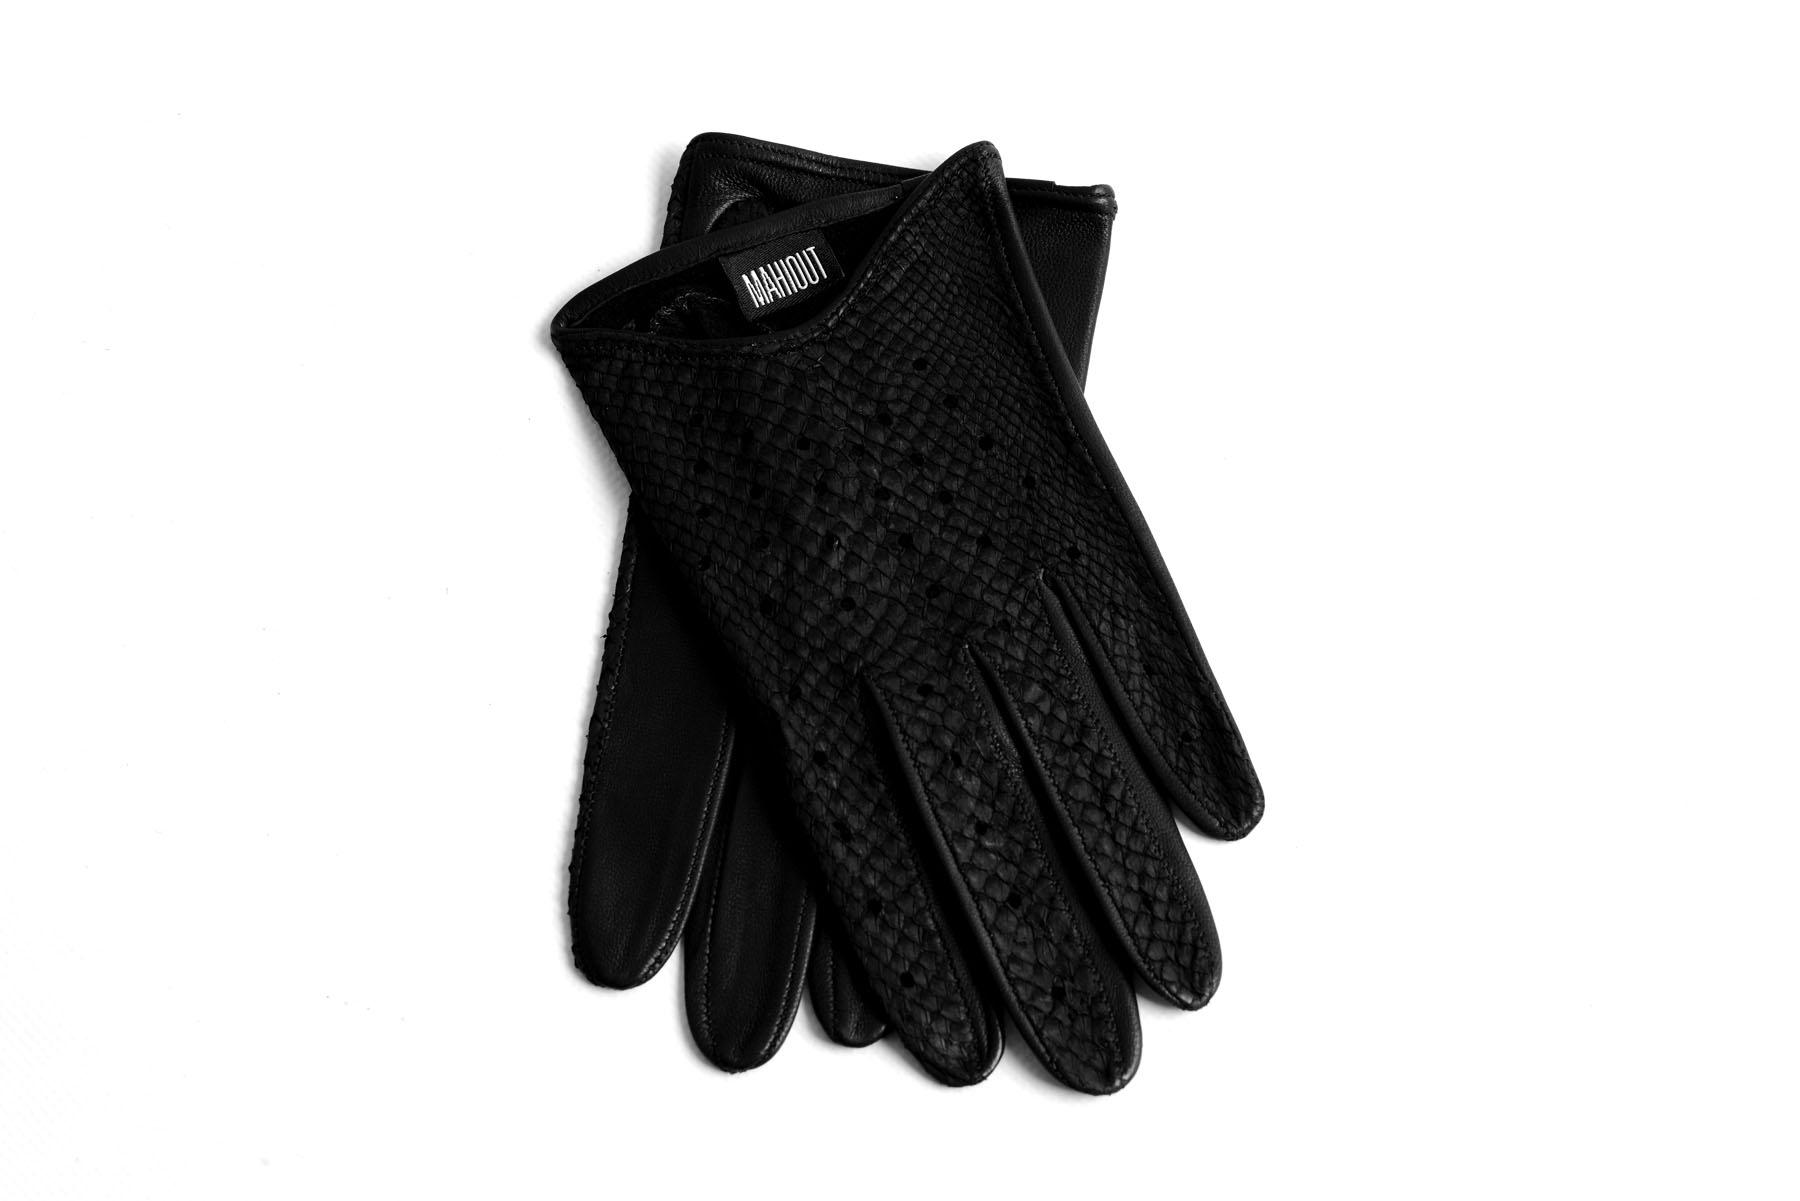 Mahiout Jeno gloves in salmon skin